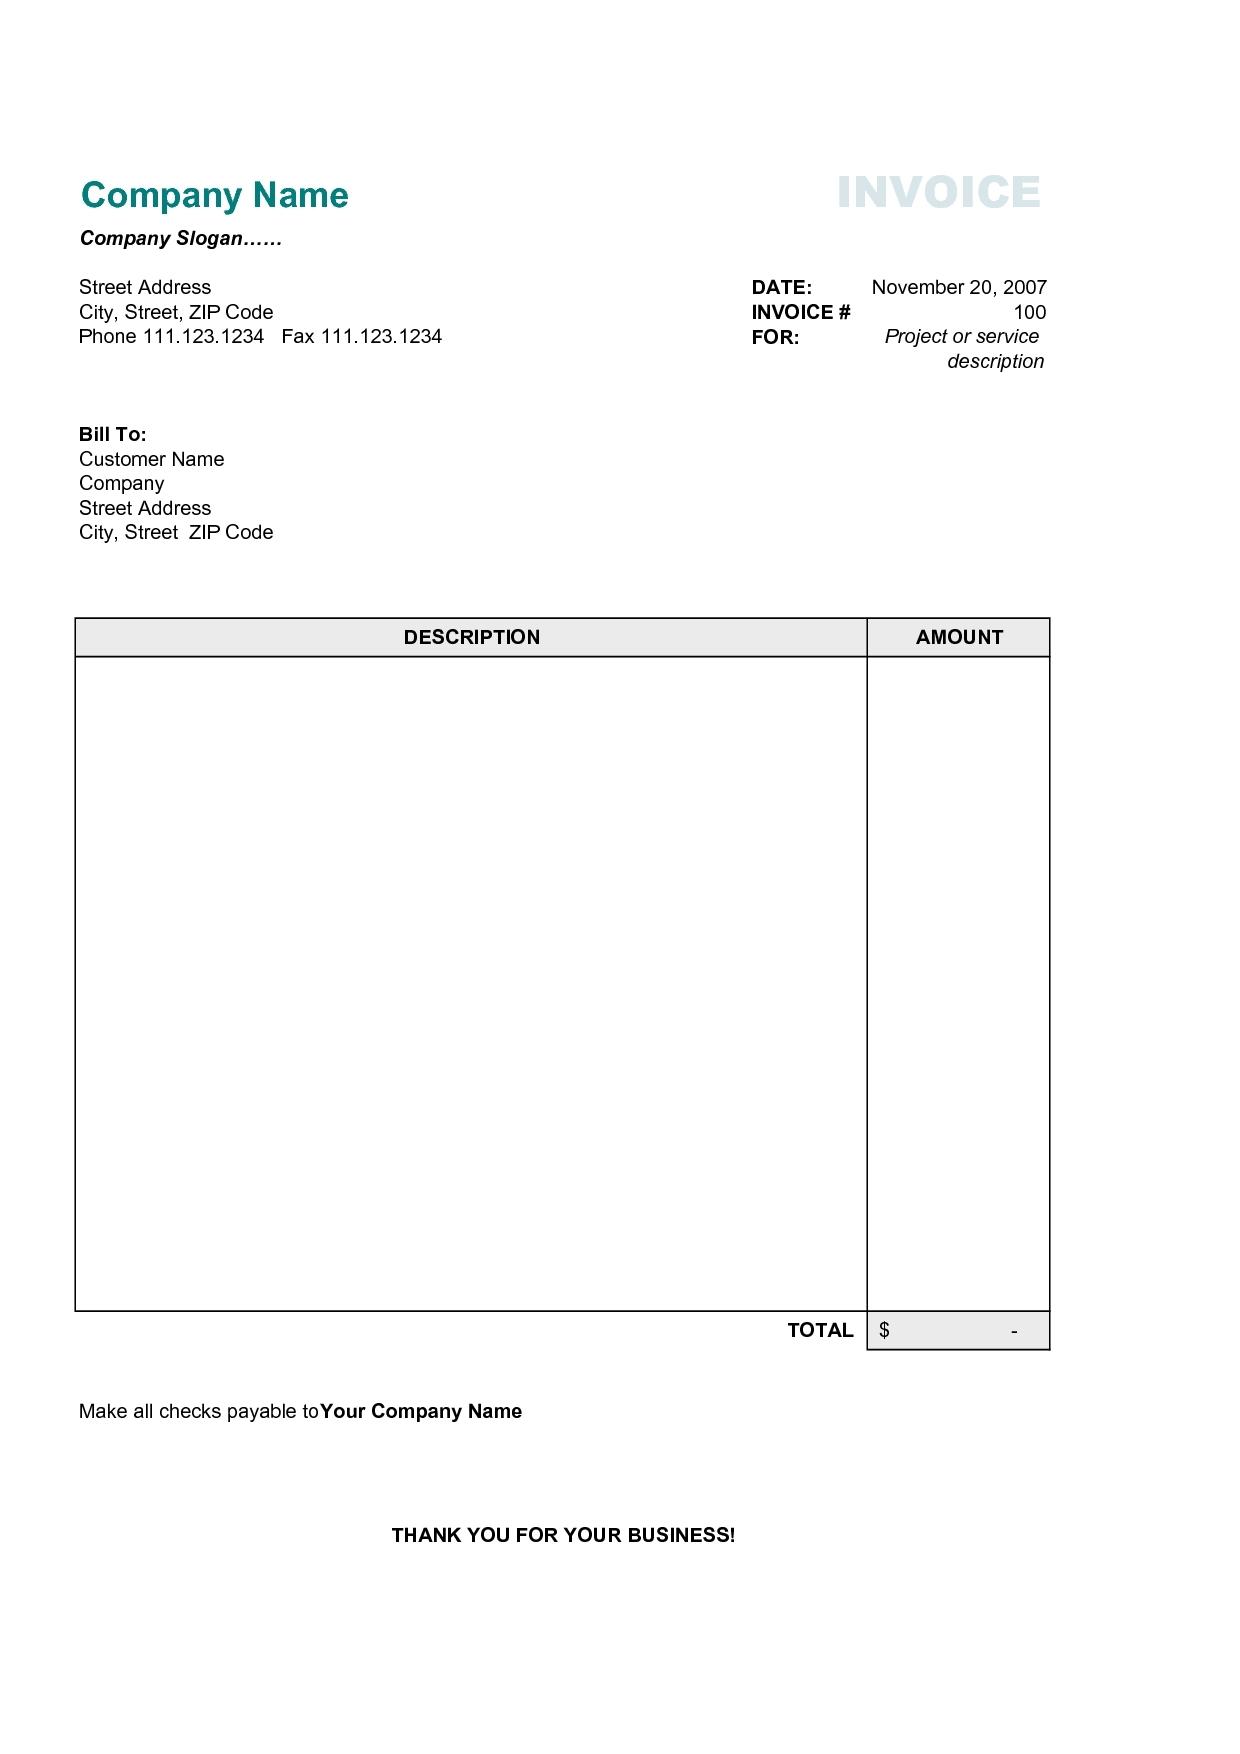 invoice receipt template word car test engineer cover letter wine free invoice receipt template